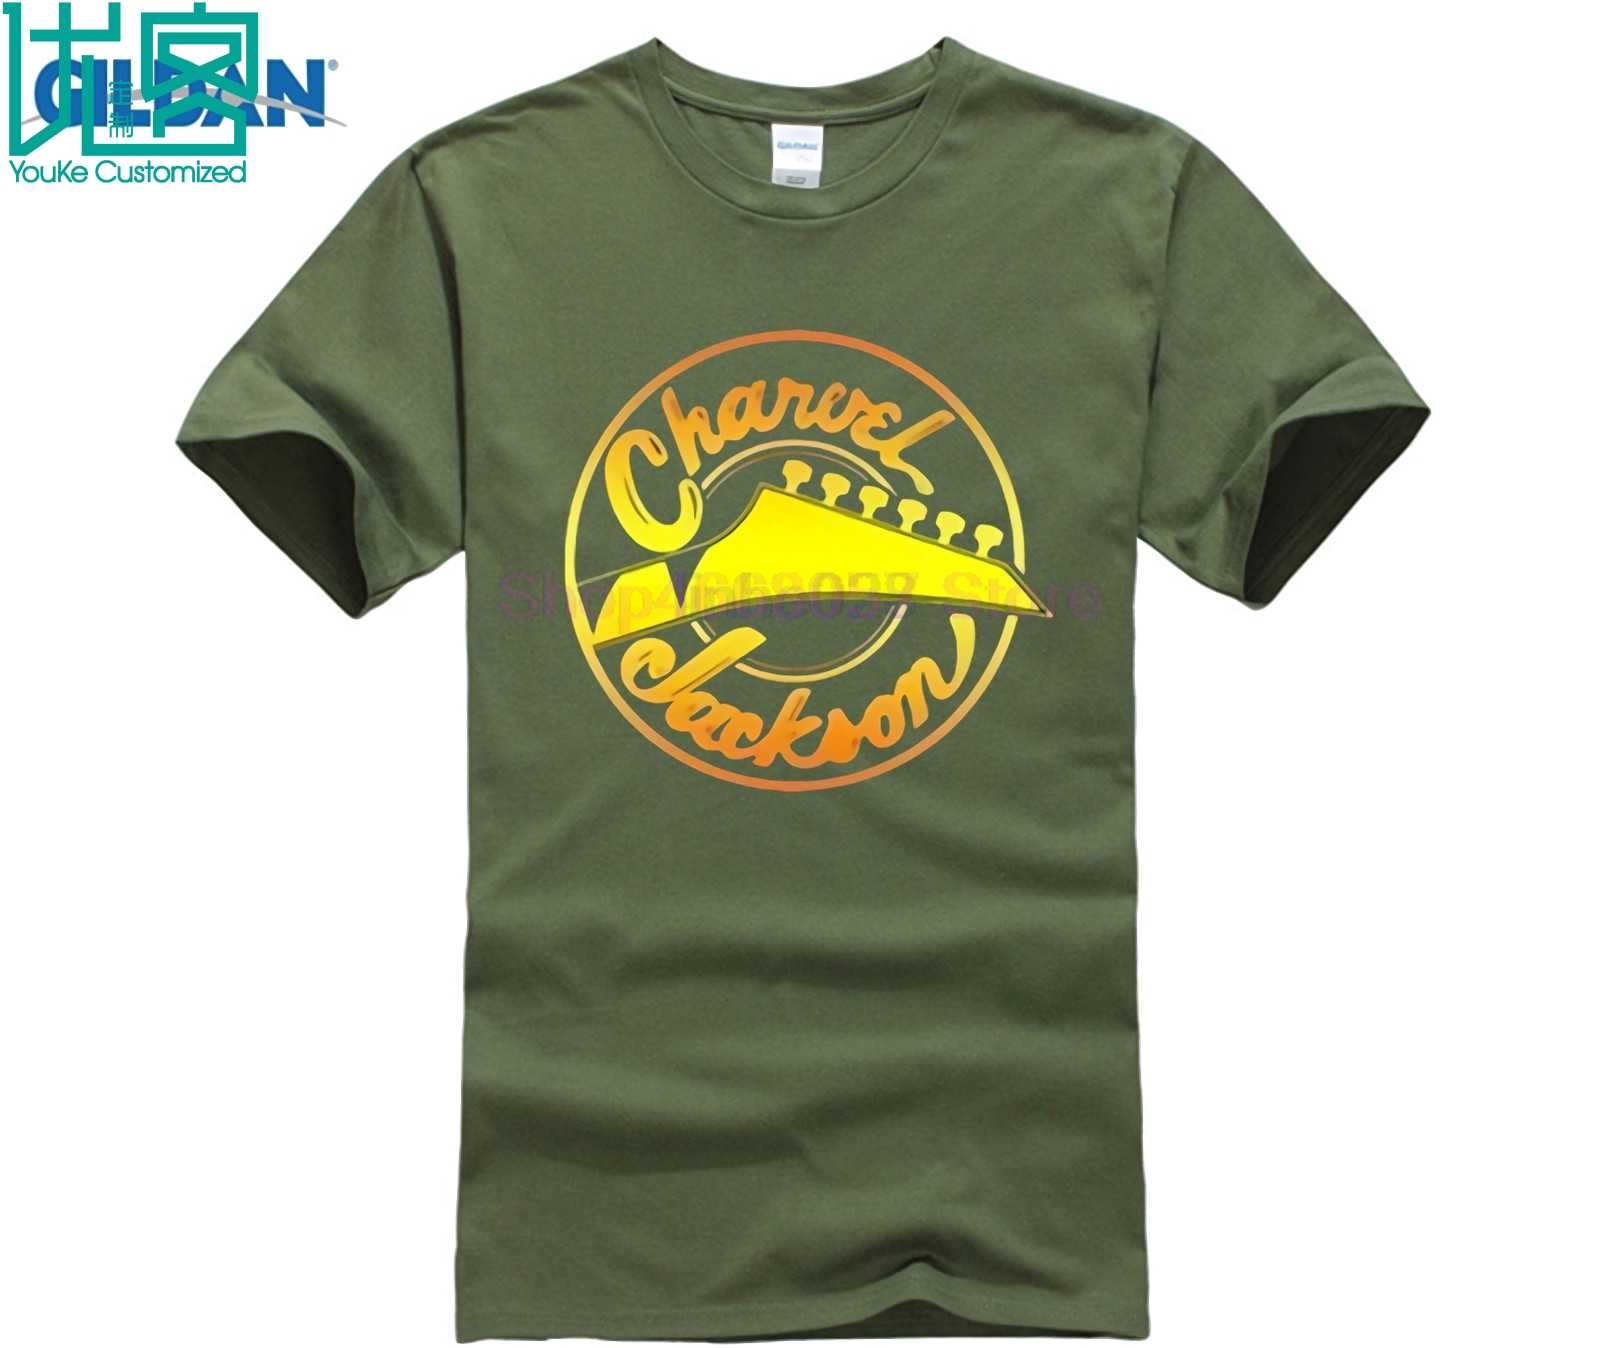 Charvel Jackson Gitar Pria Pria T Shirt TEE T Shirt 100% Katun S-3XL